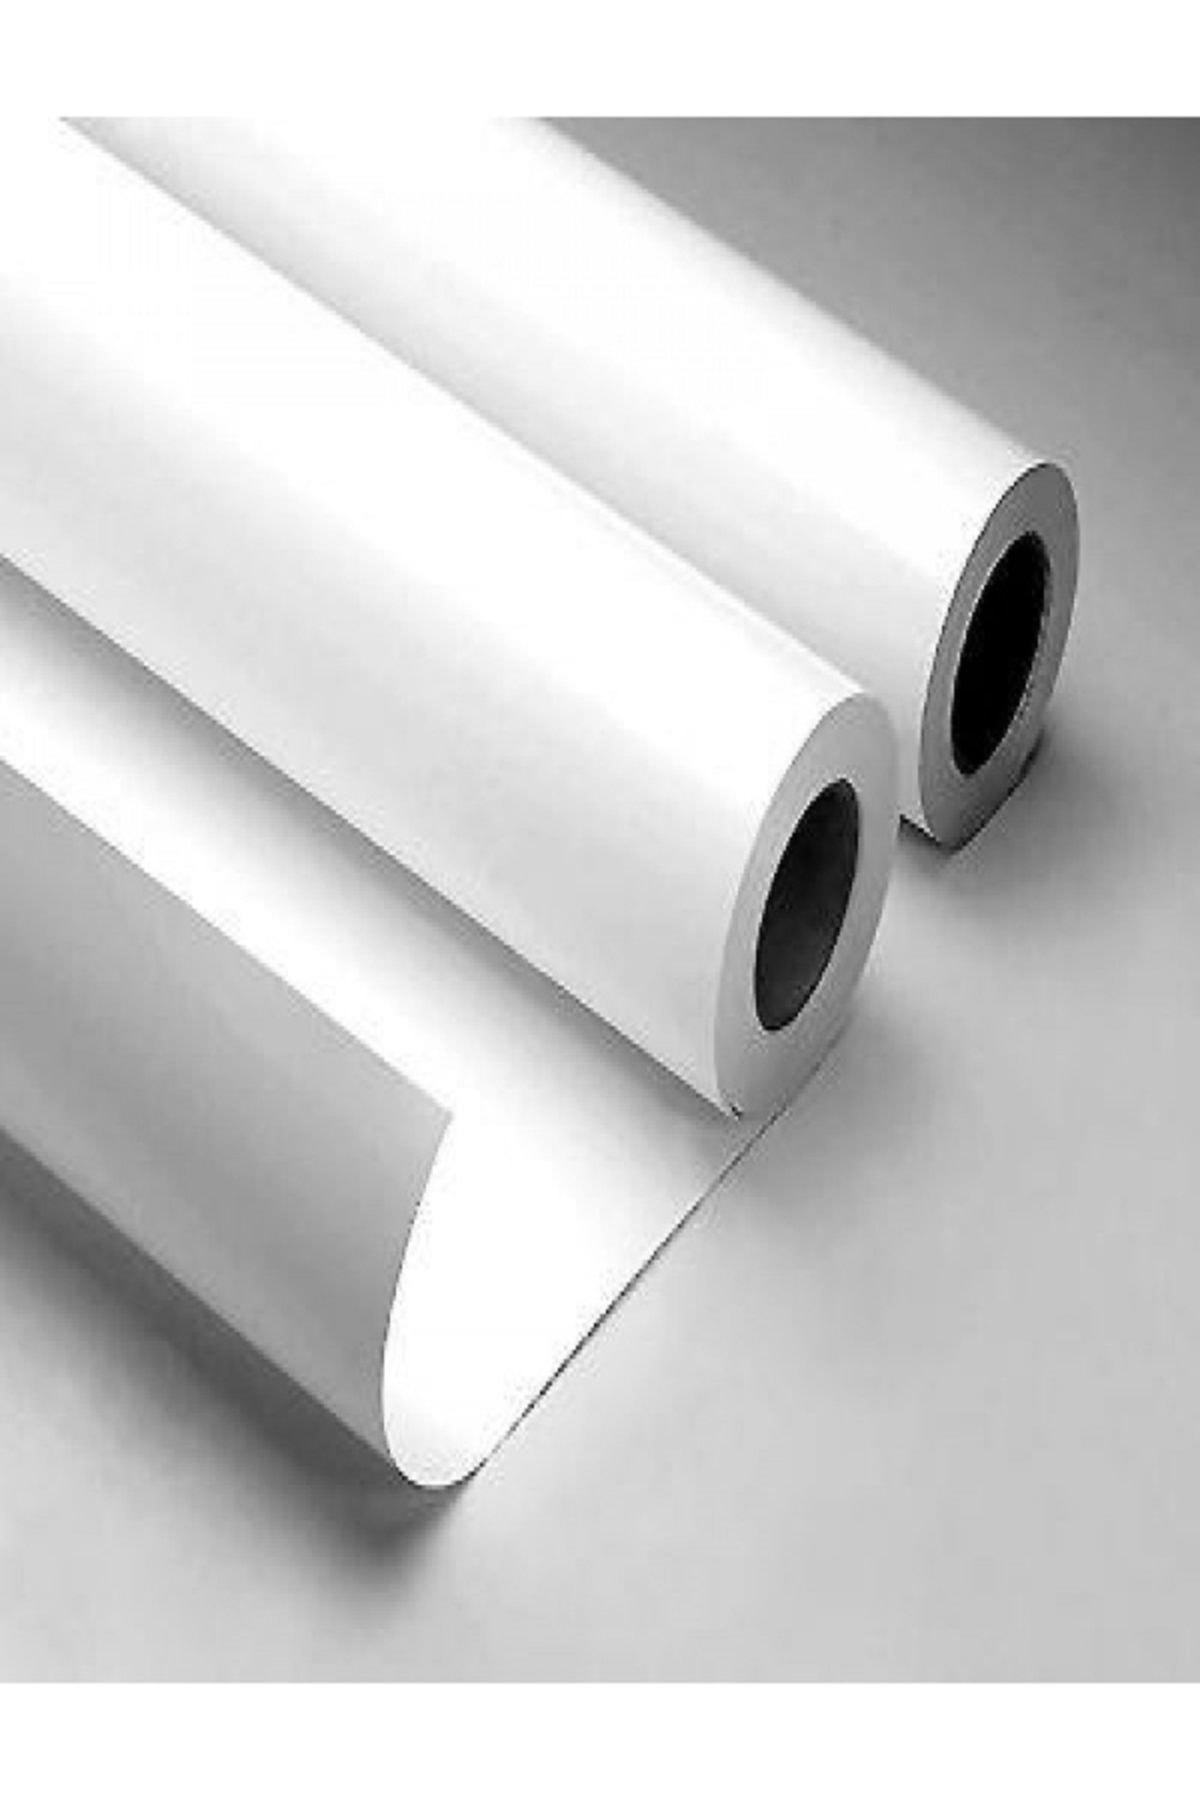 Ecce Mat  Beyaz Yapışkanlı Folyo  75 cm  X 9 mt 1